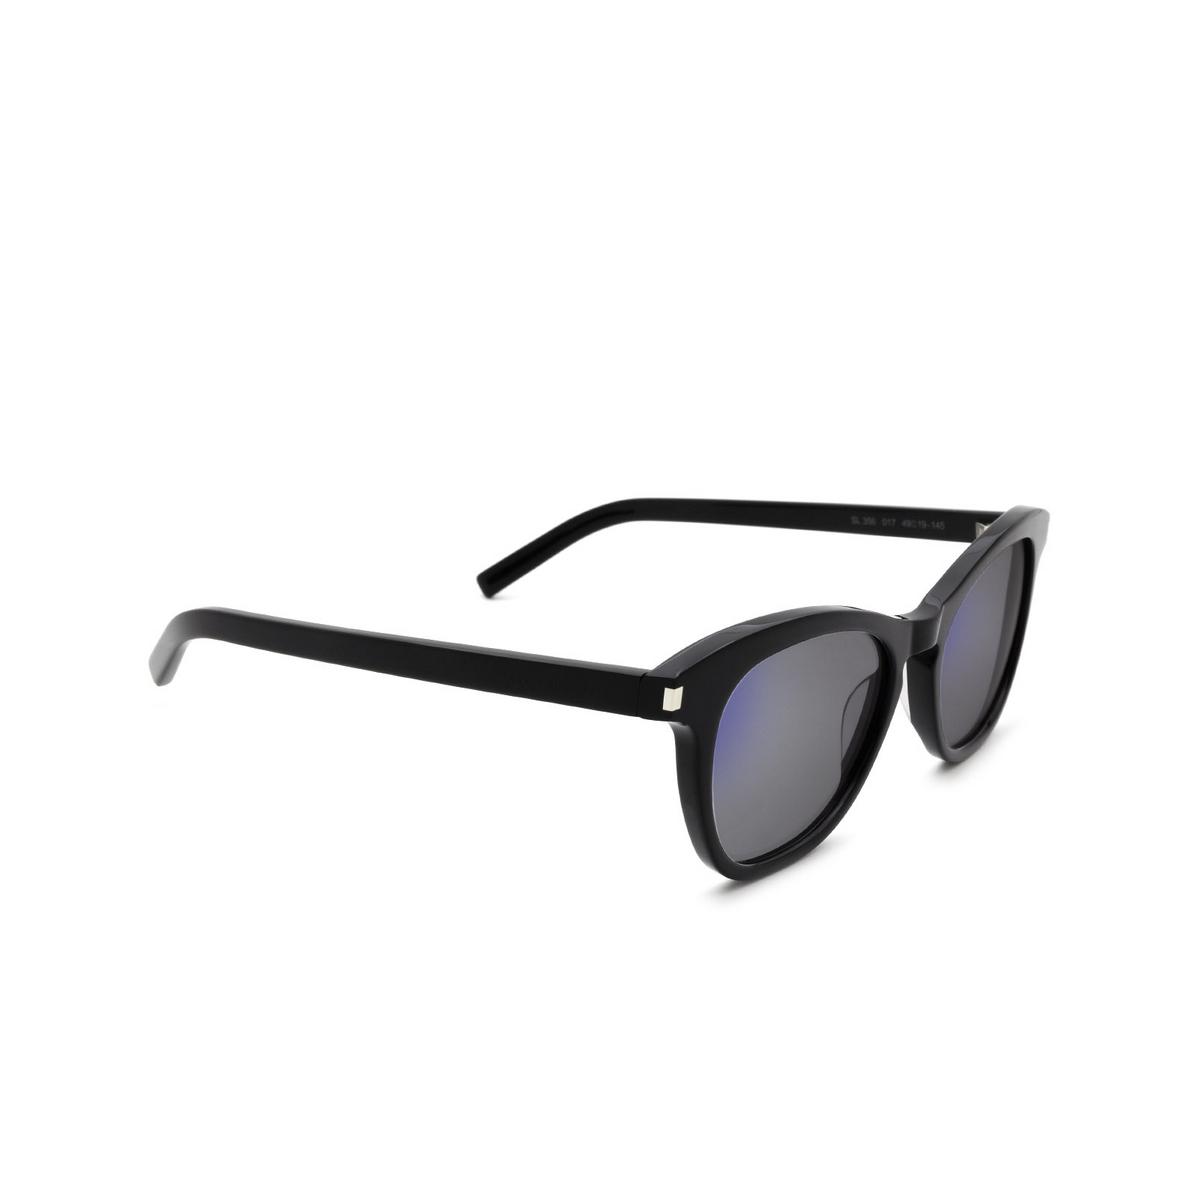 Saint Laurent® Cat-eye Sunglasses: SL 356 color Black 017 - three-quarters view.